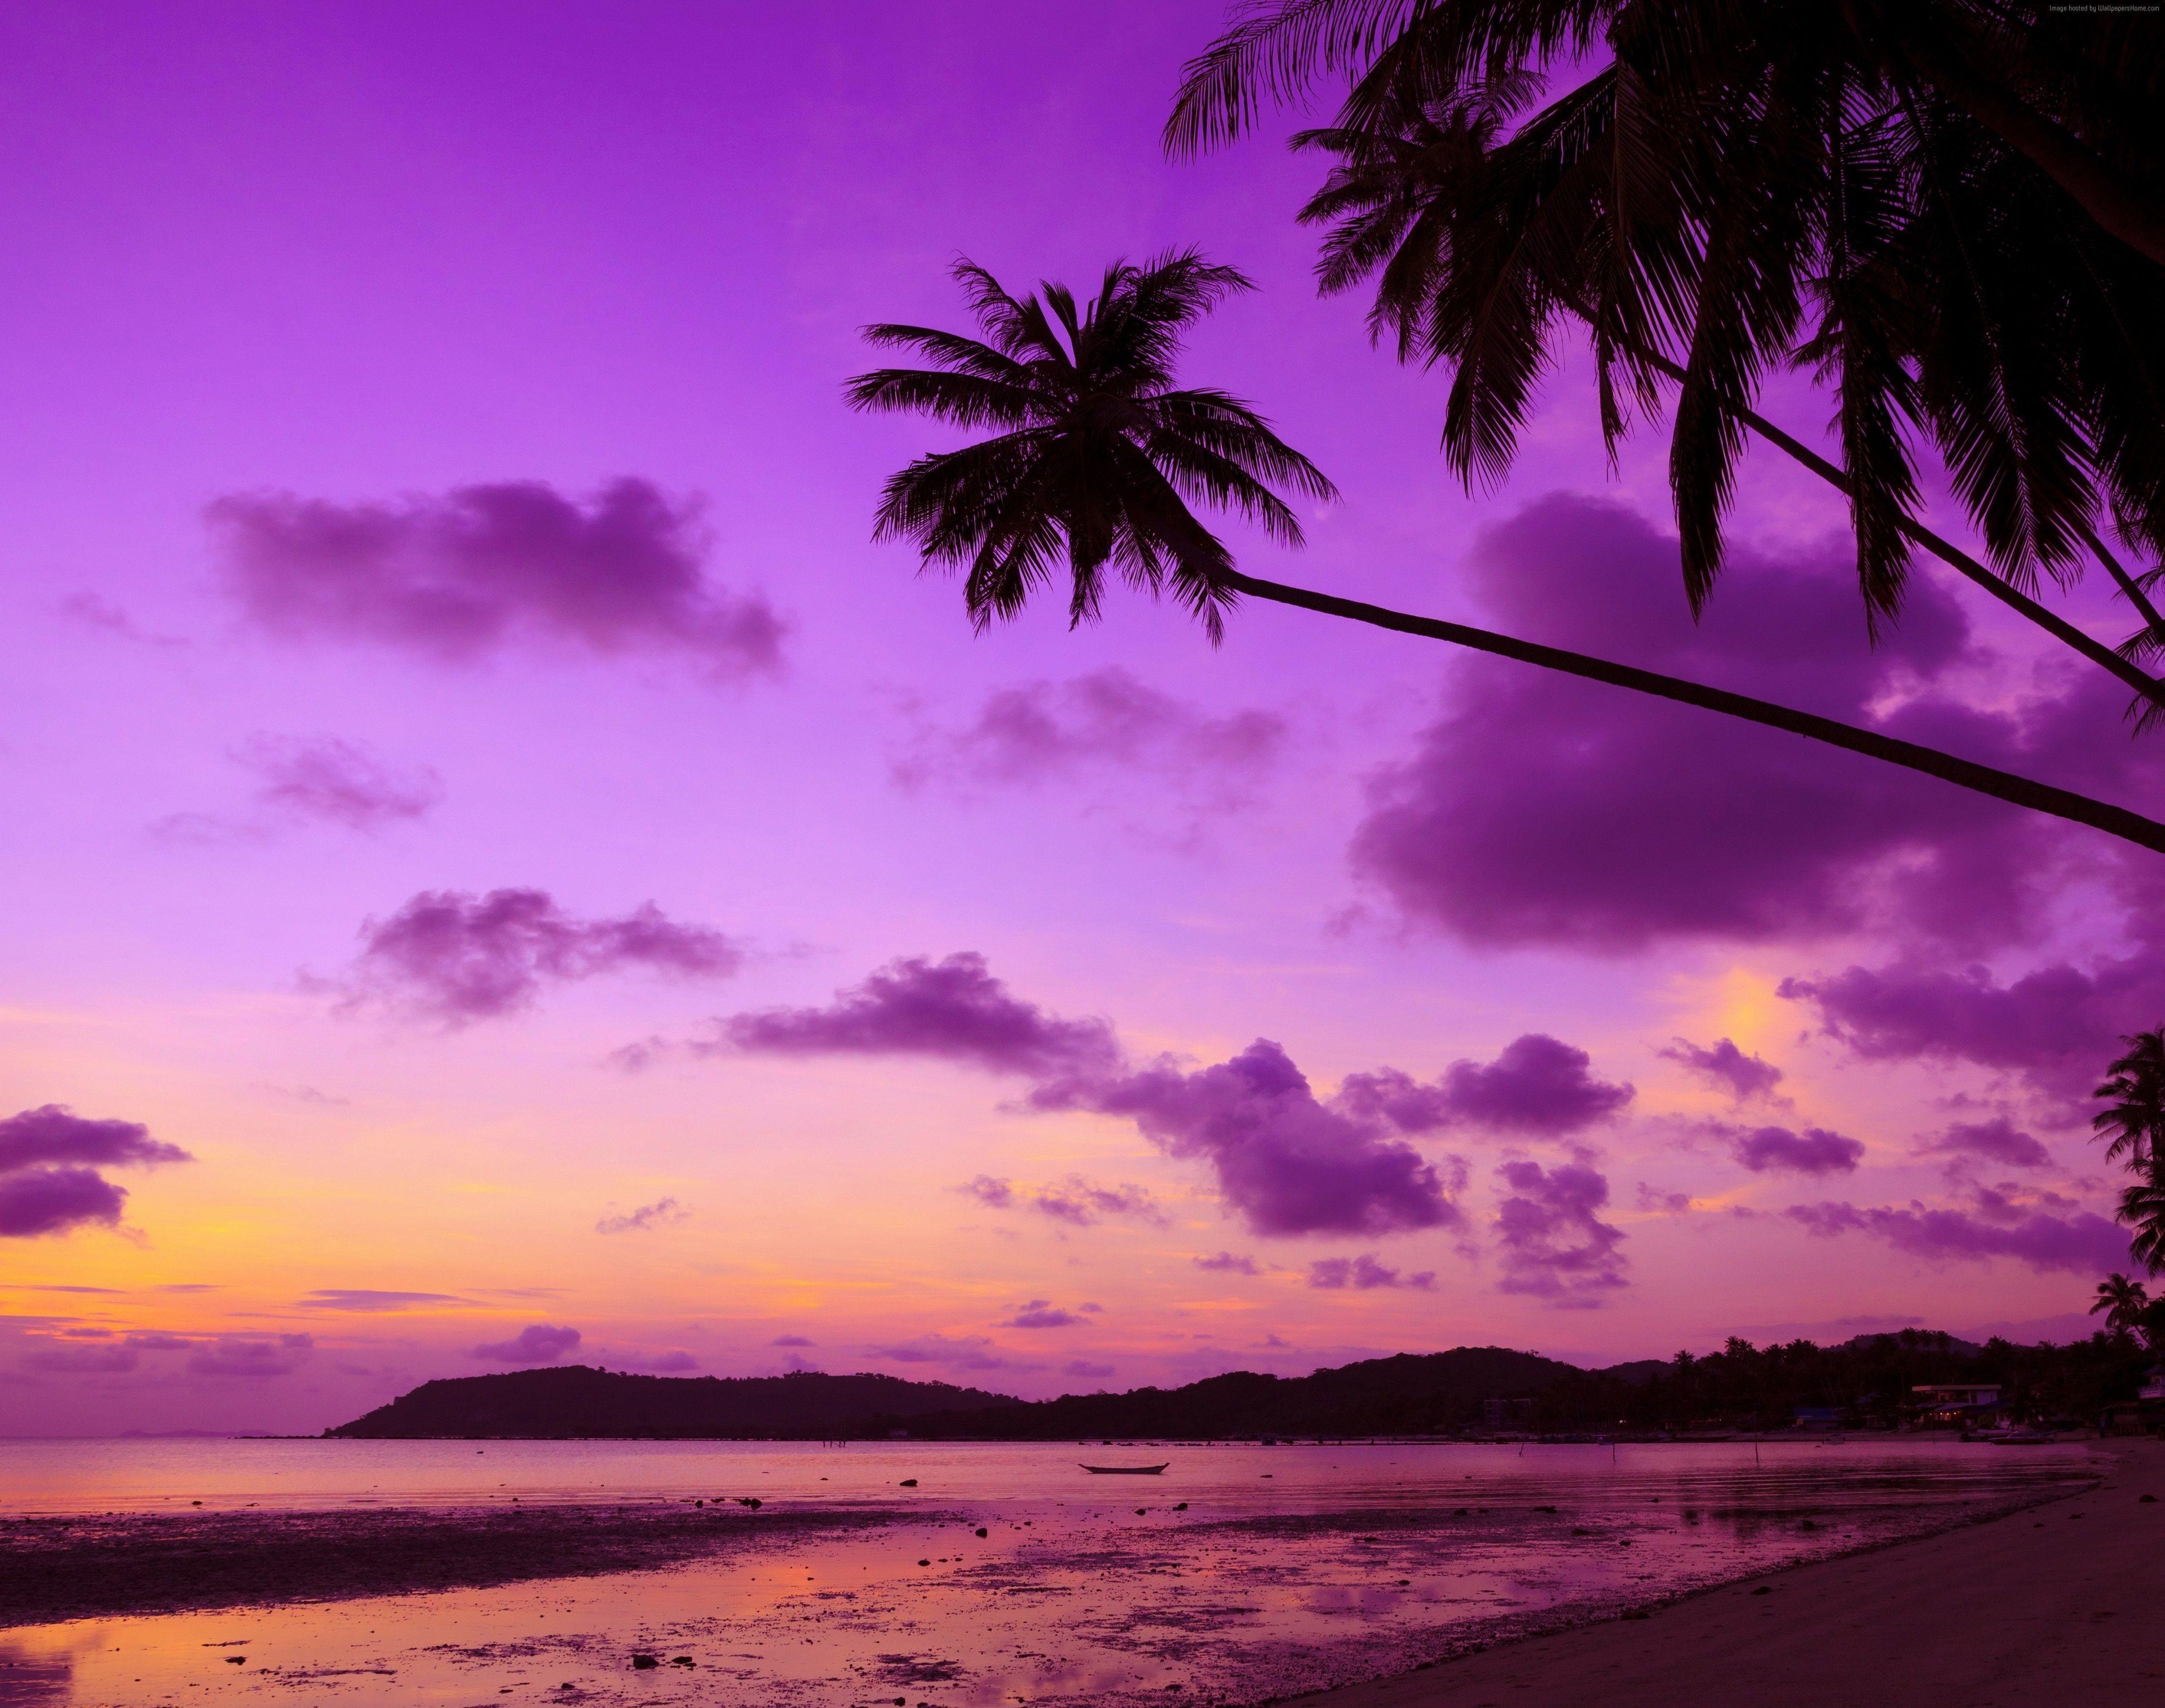 3840x3029 Trees 4k Wallpaper Hd Full Screen Purple Sky Palm Wallpaper Thailand Wallpaper